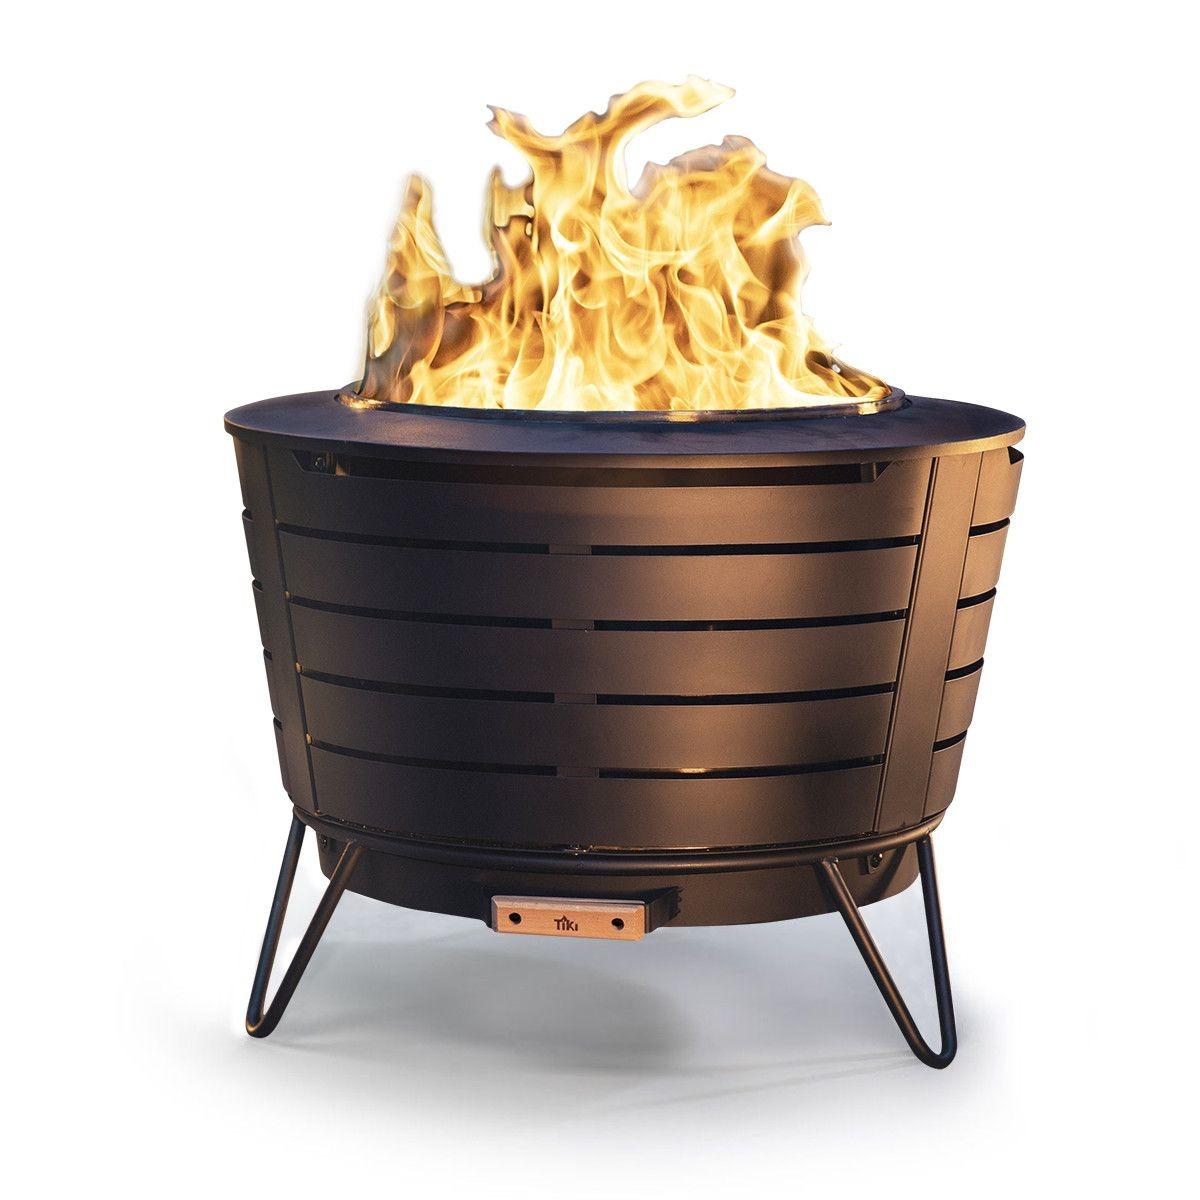 Tiki Brand Patio Fire Pit